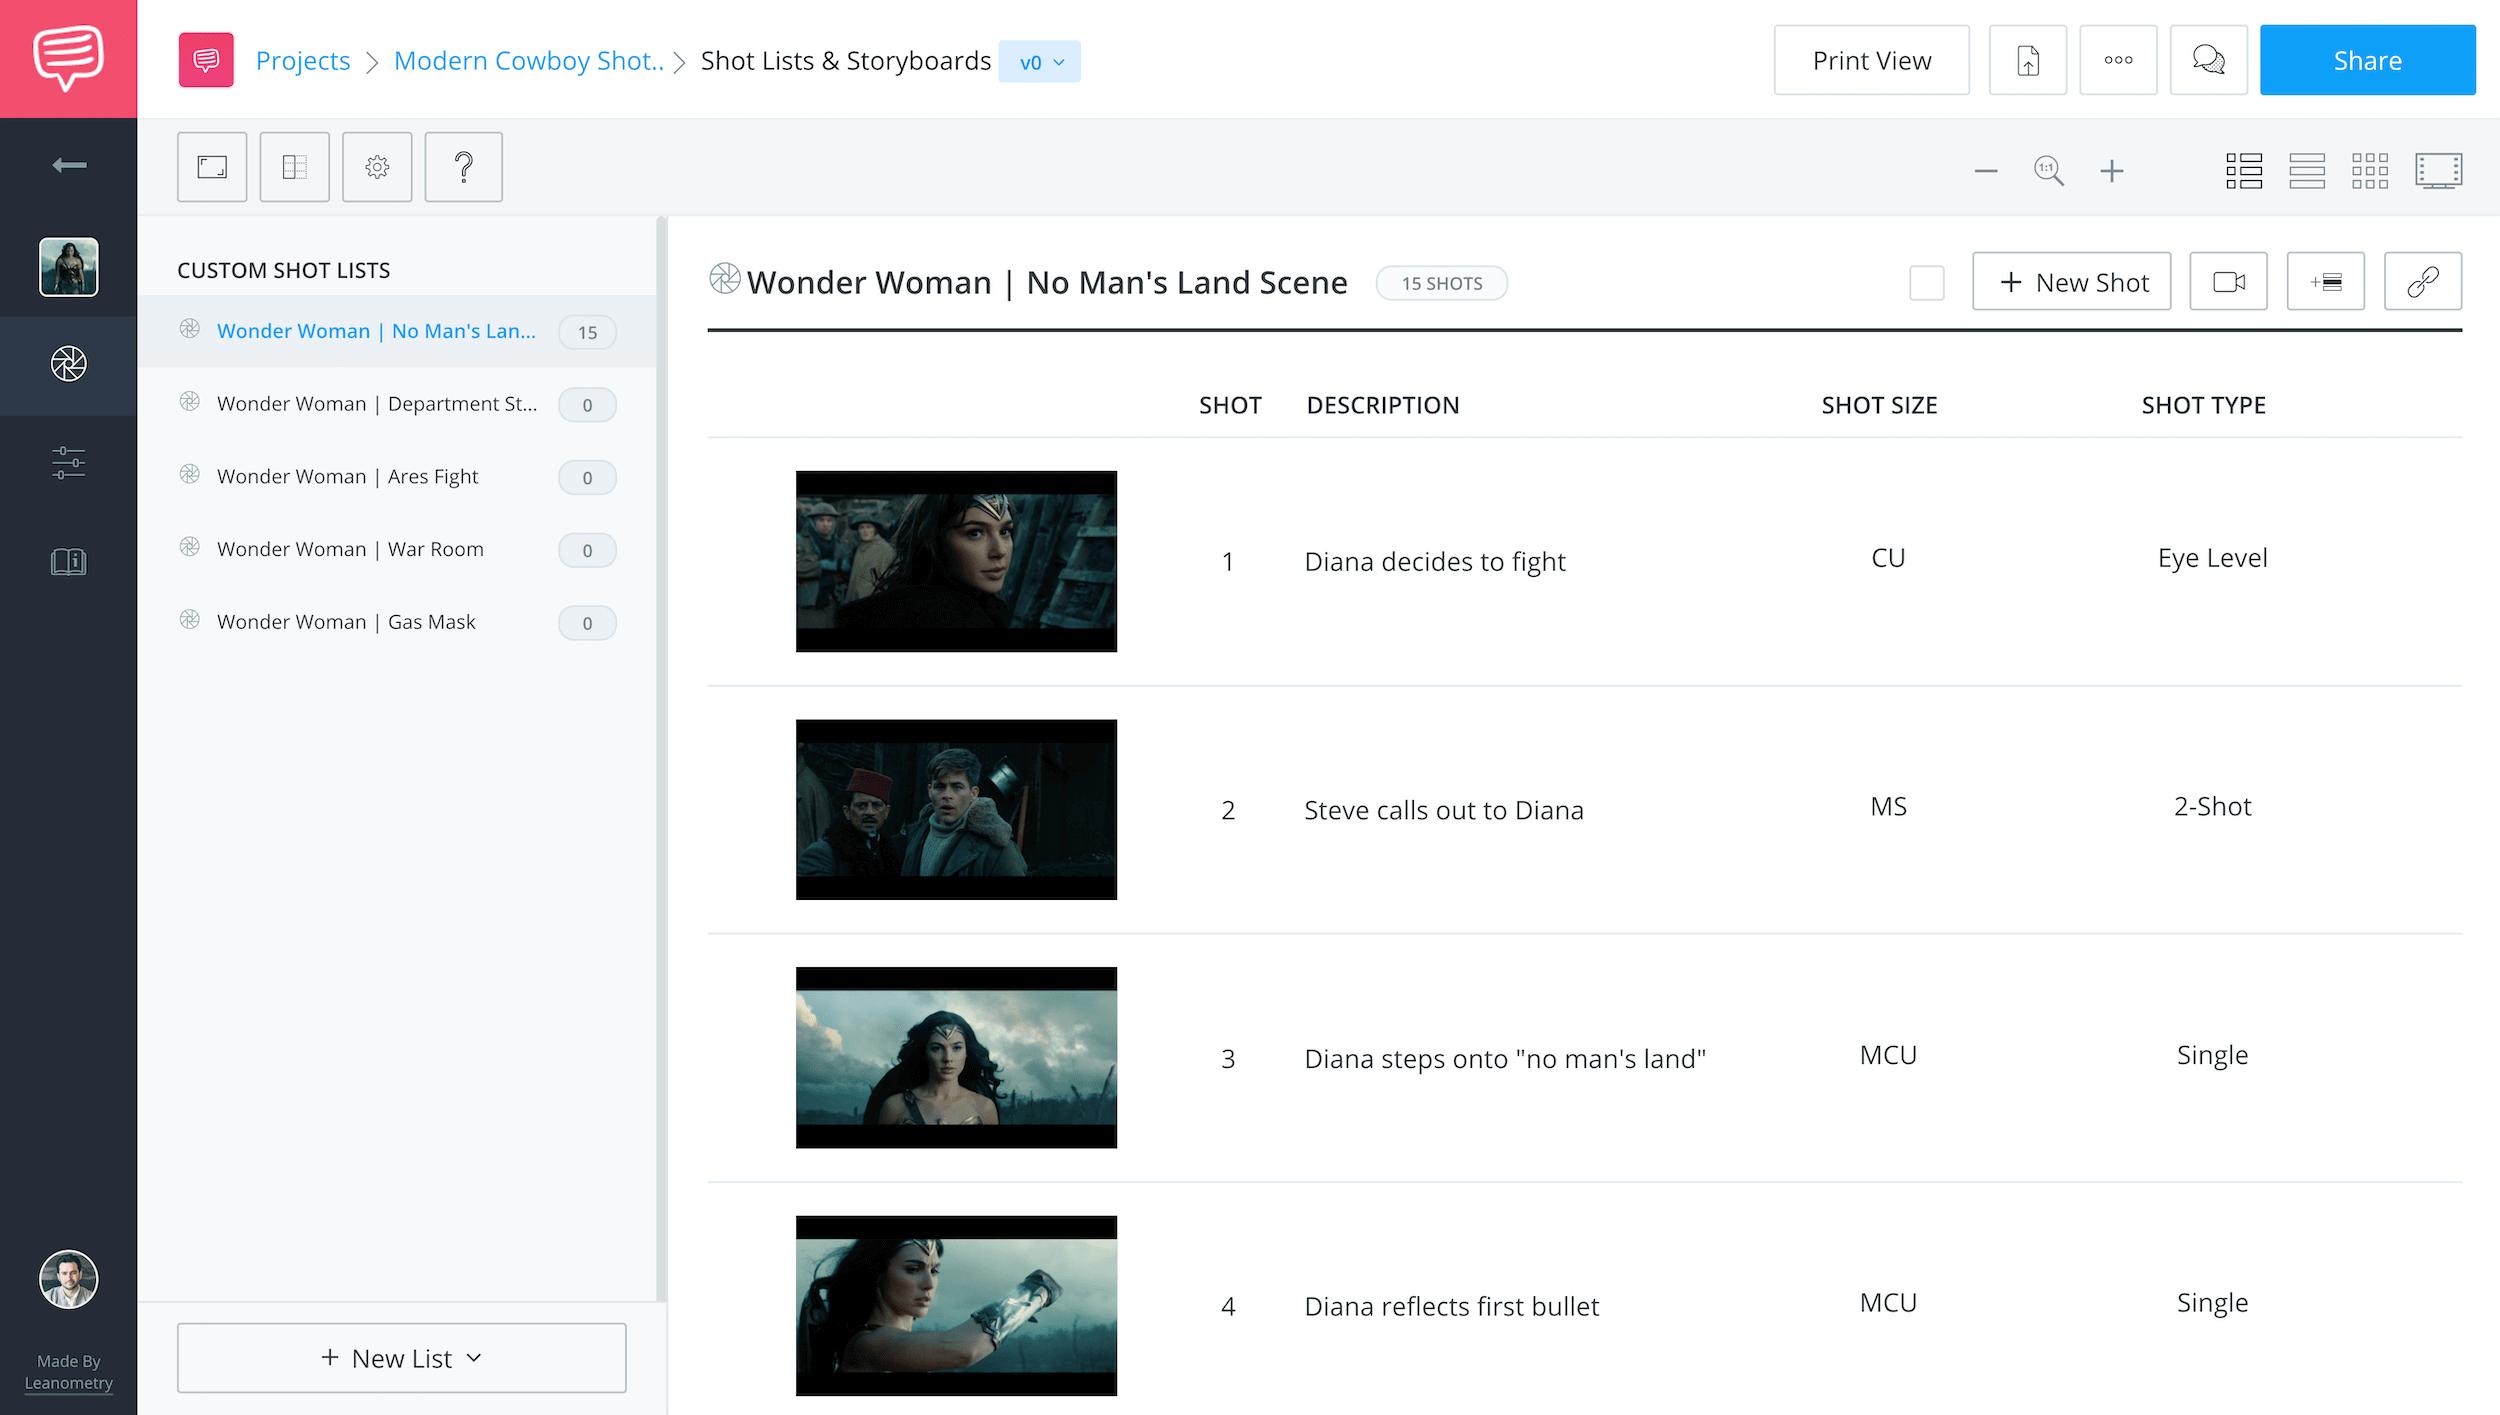 Free Shot List Software App and Shot List Template - StudioBinder